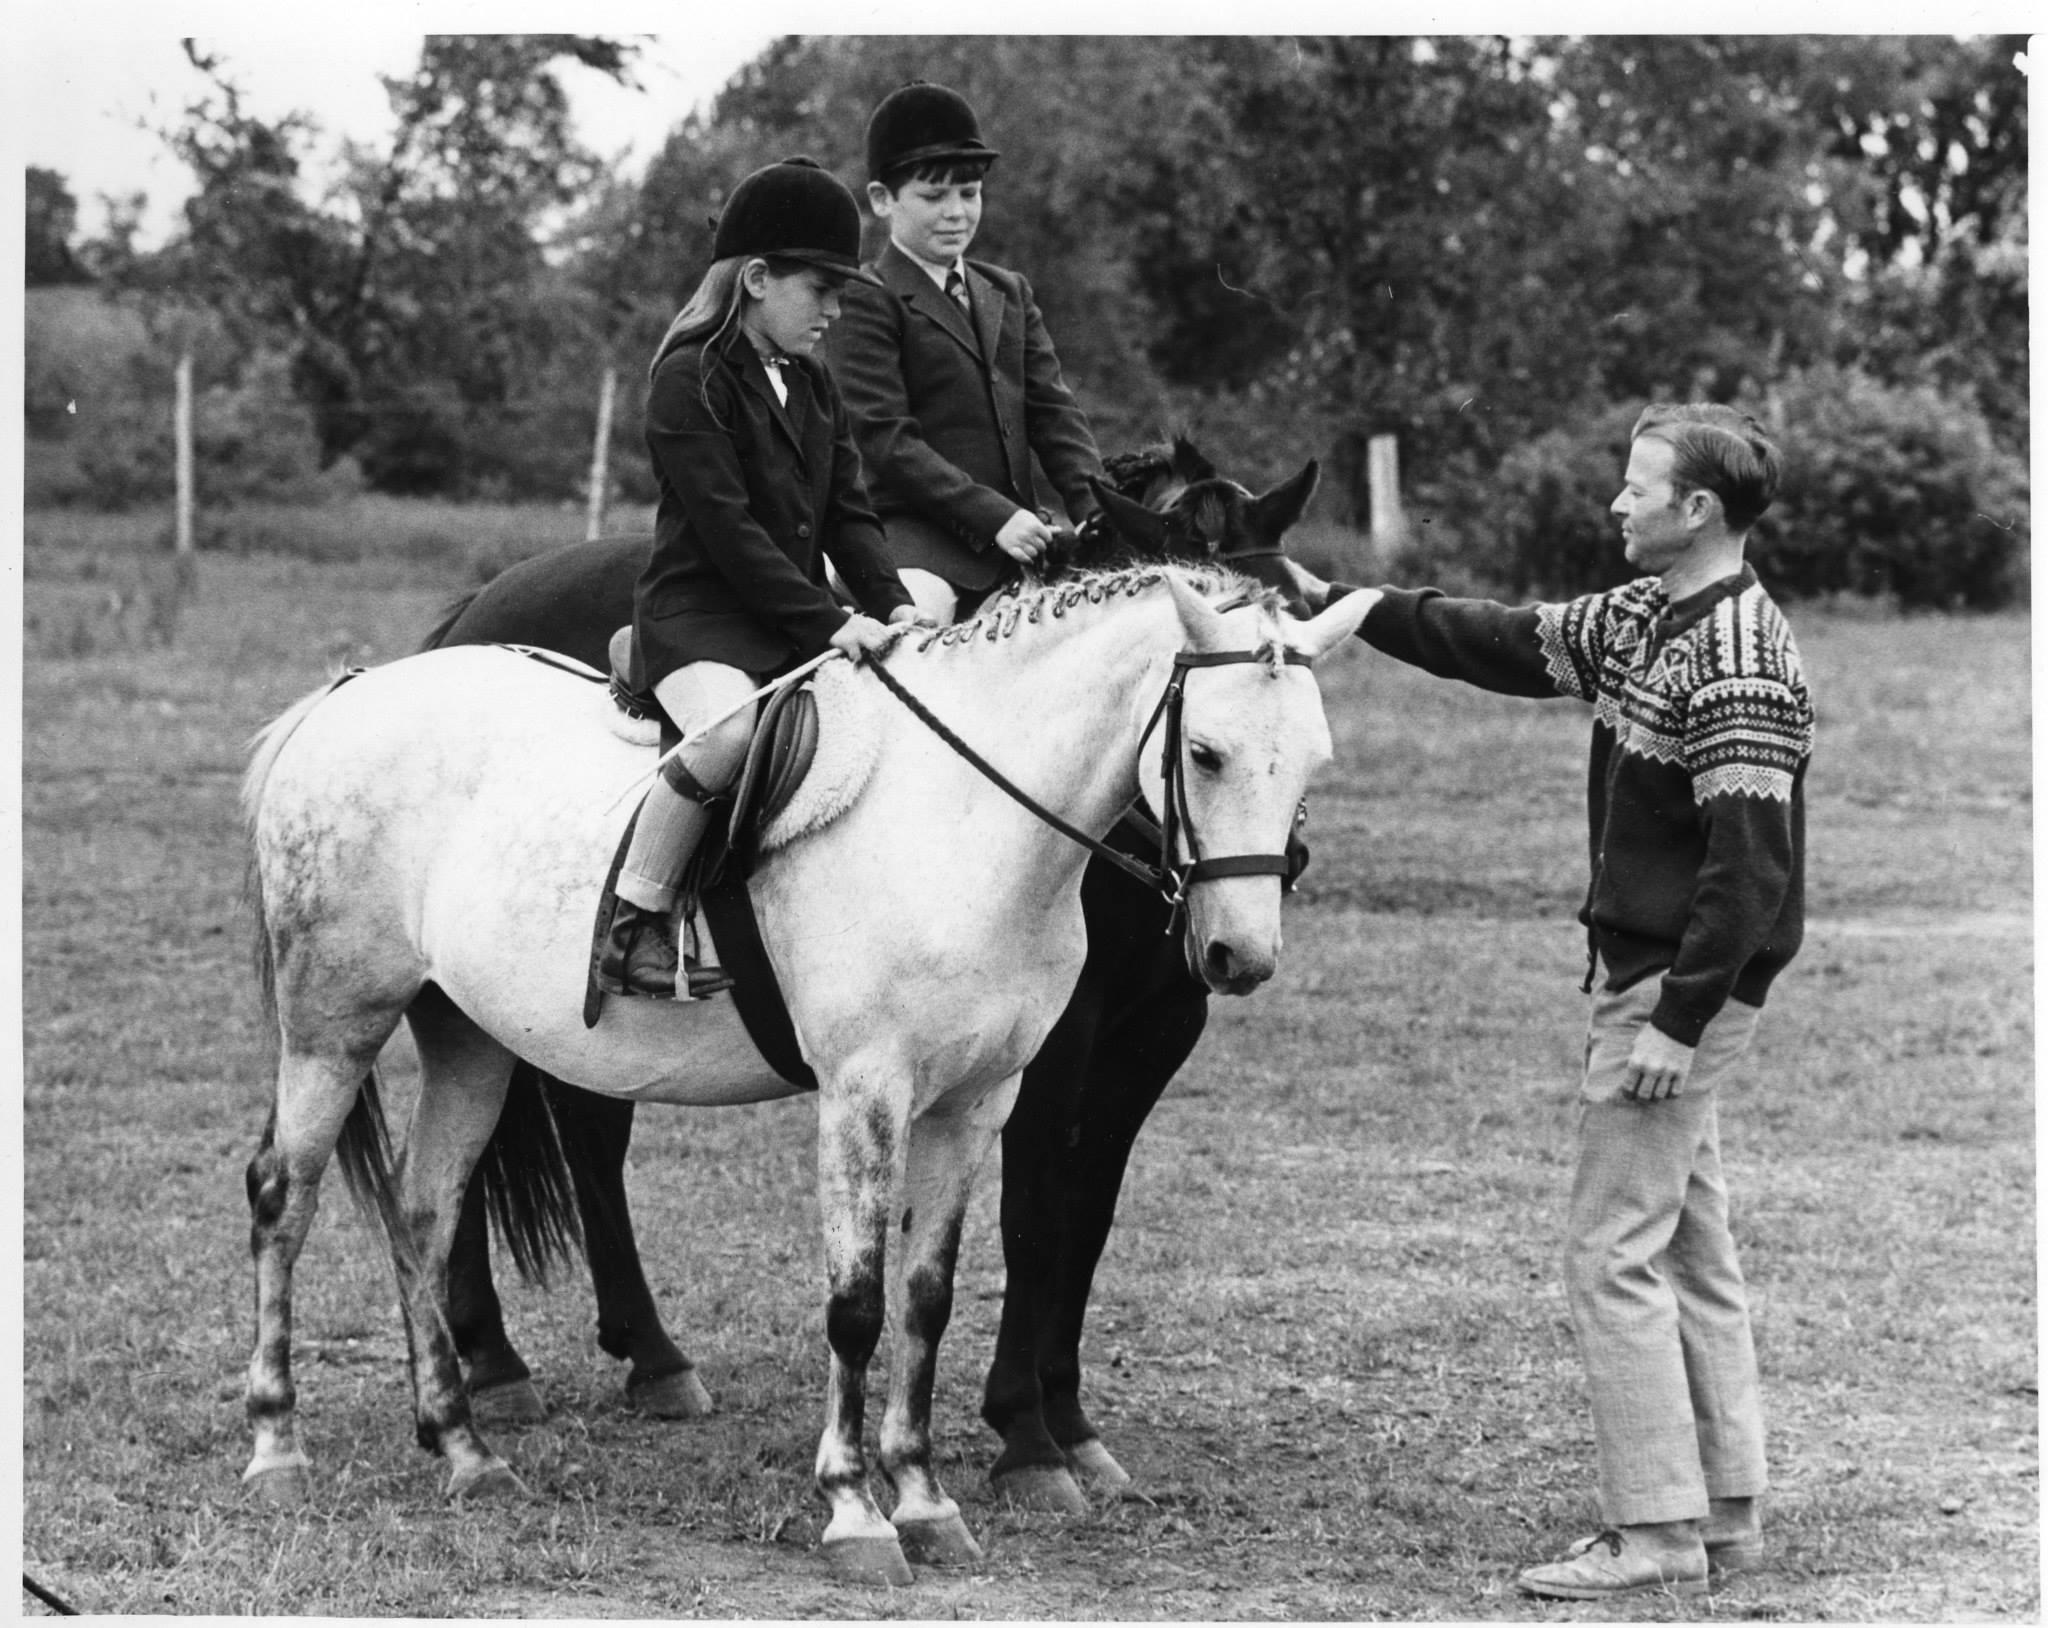 Showjumping Legend: Beezie Madden - photo Beezie Madden / John Madden Sales - Globetrotting horse riding holidays